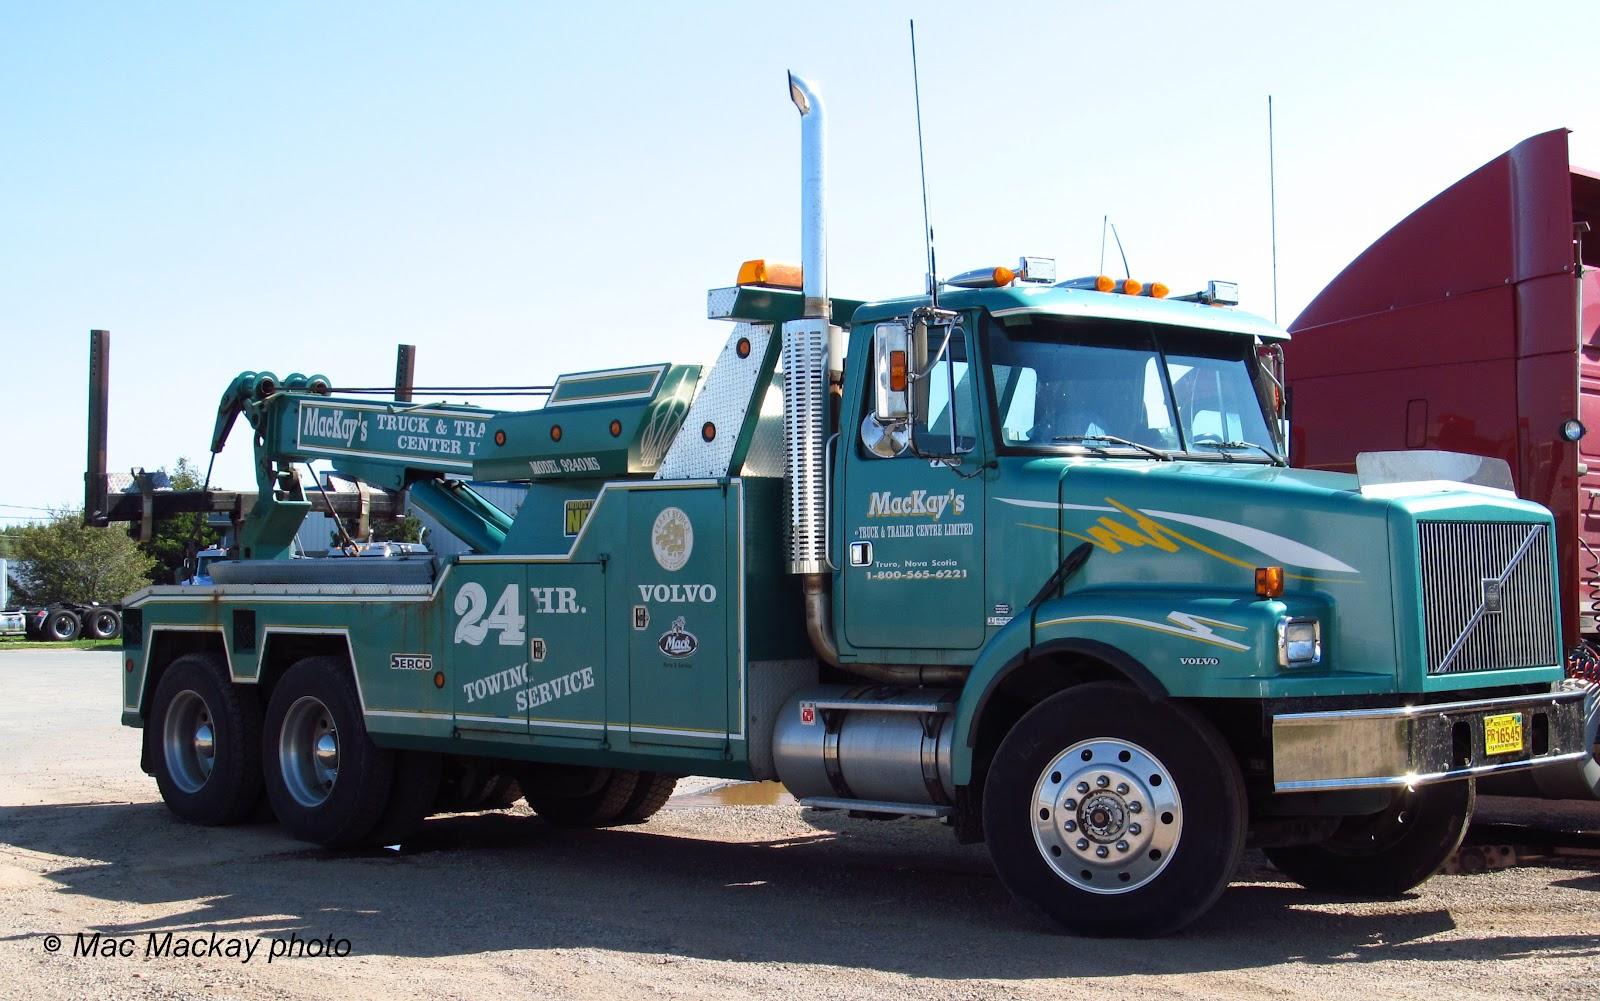 Truckfax: Veteran Wreckers from Northern Nova Scotia